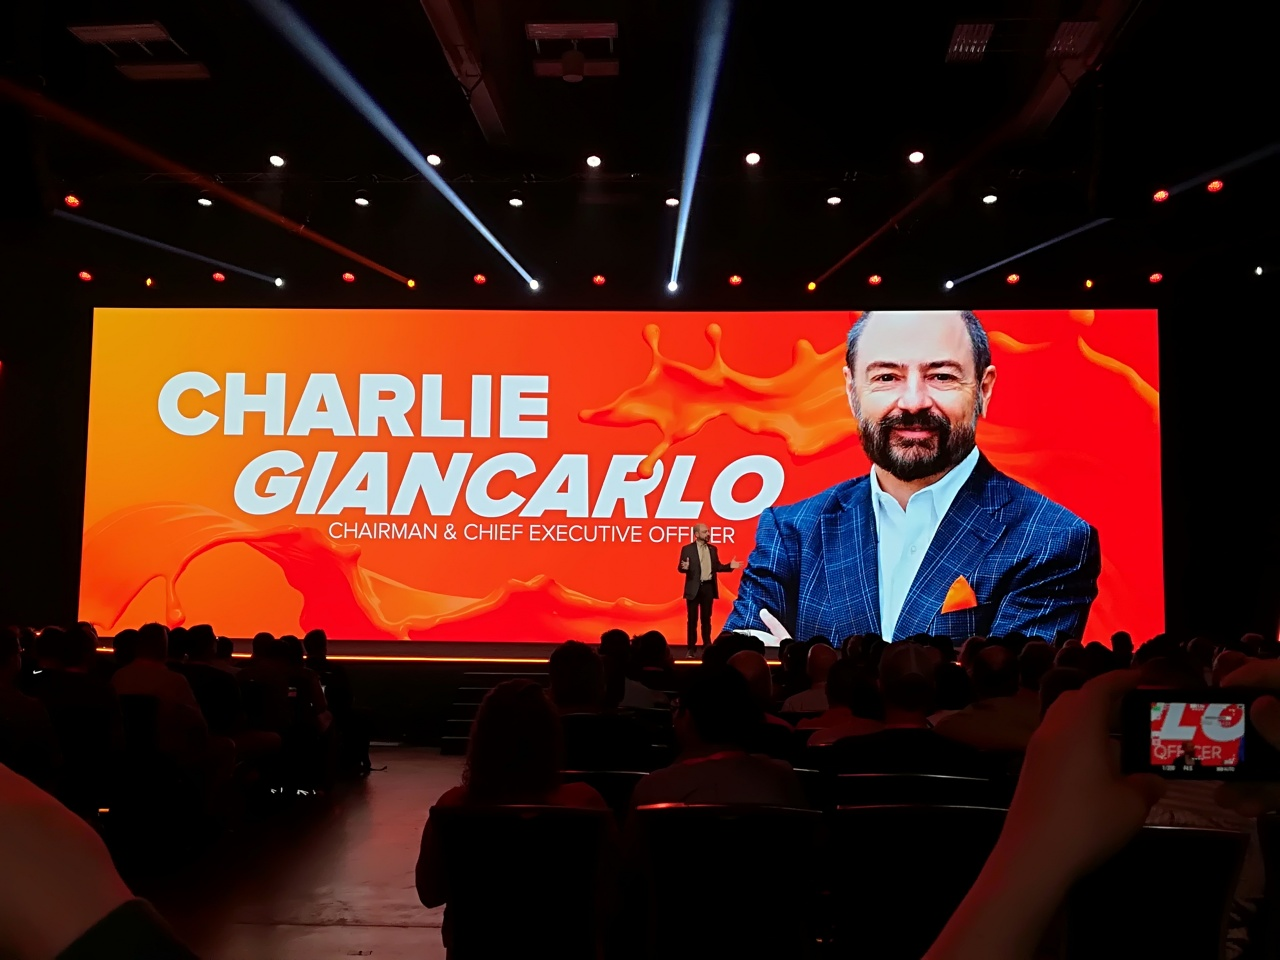 charlie giancarlo